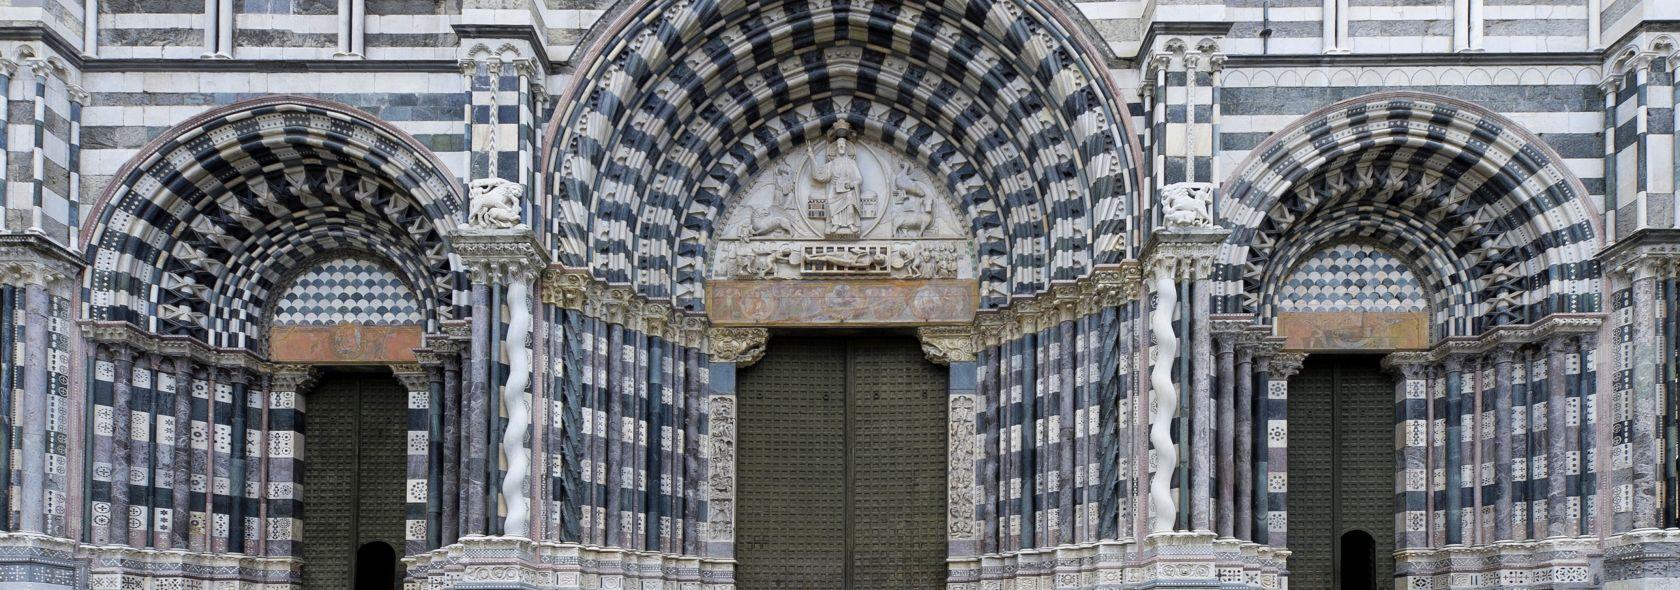 Cattedrale di San Lorenzo: portali - Adobe Stock - Liguria Digitale